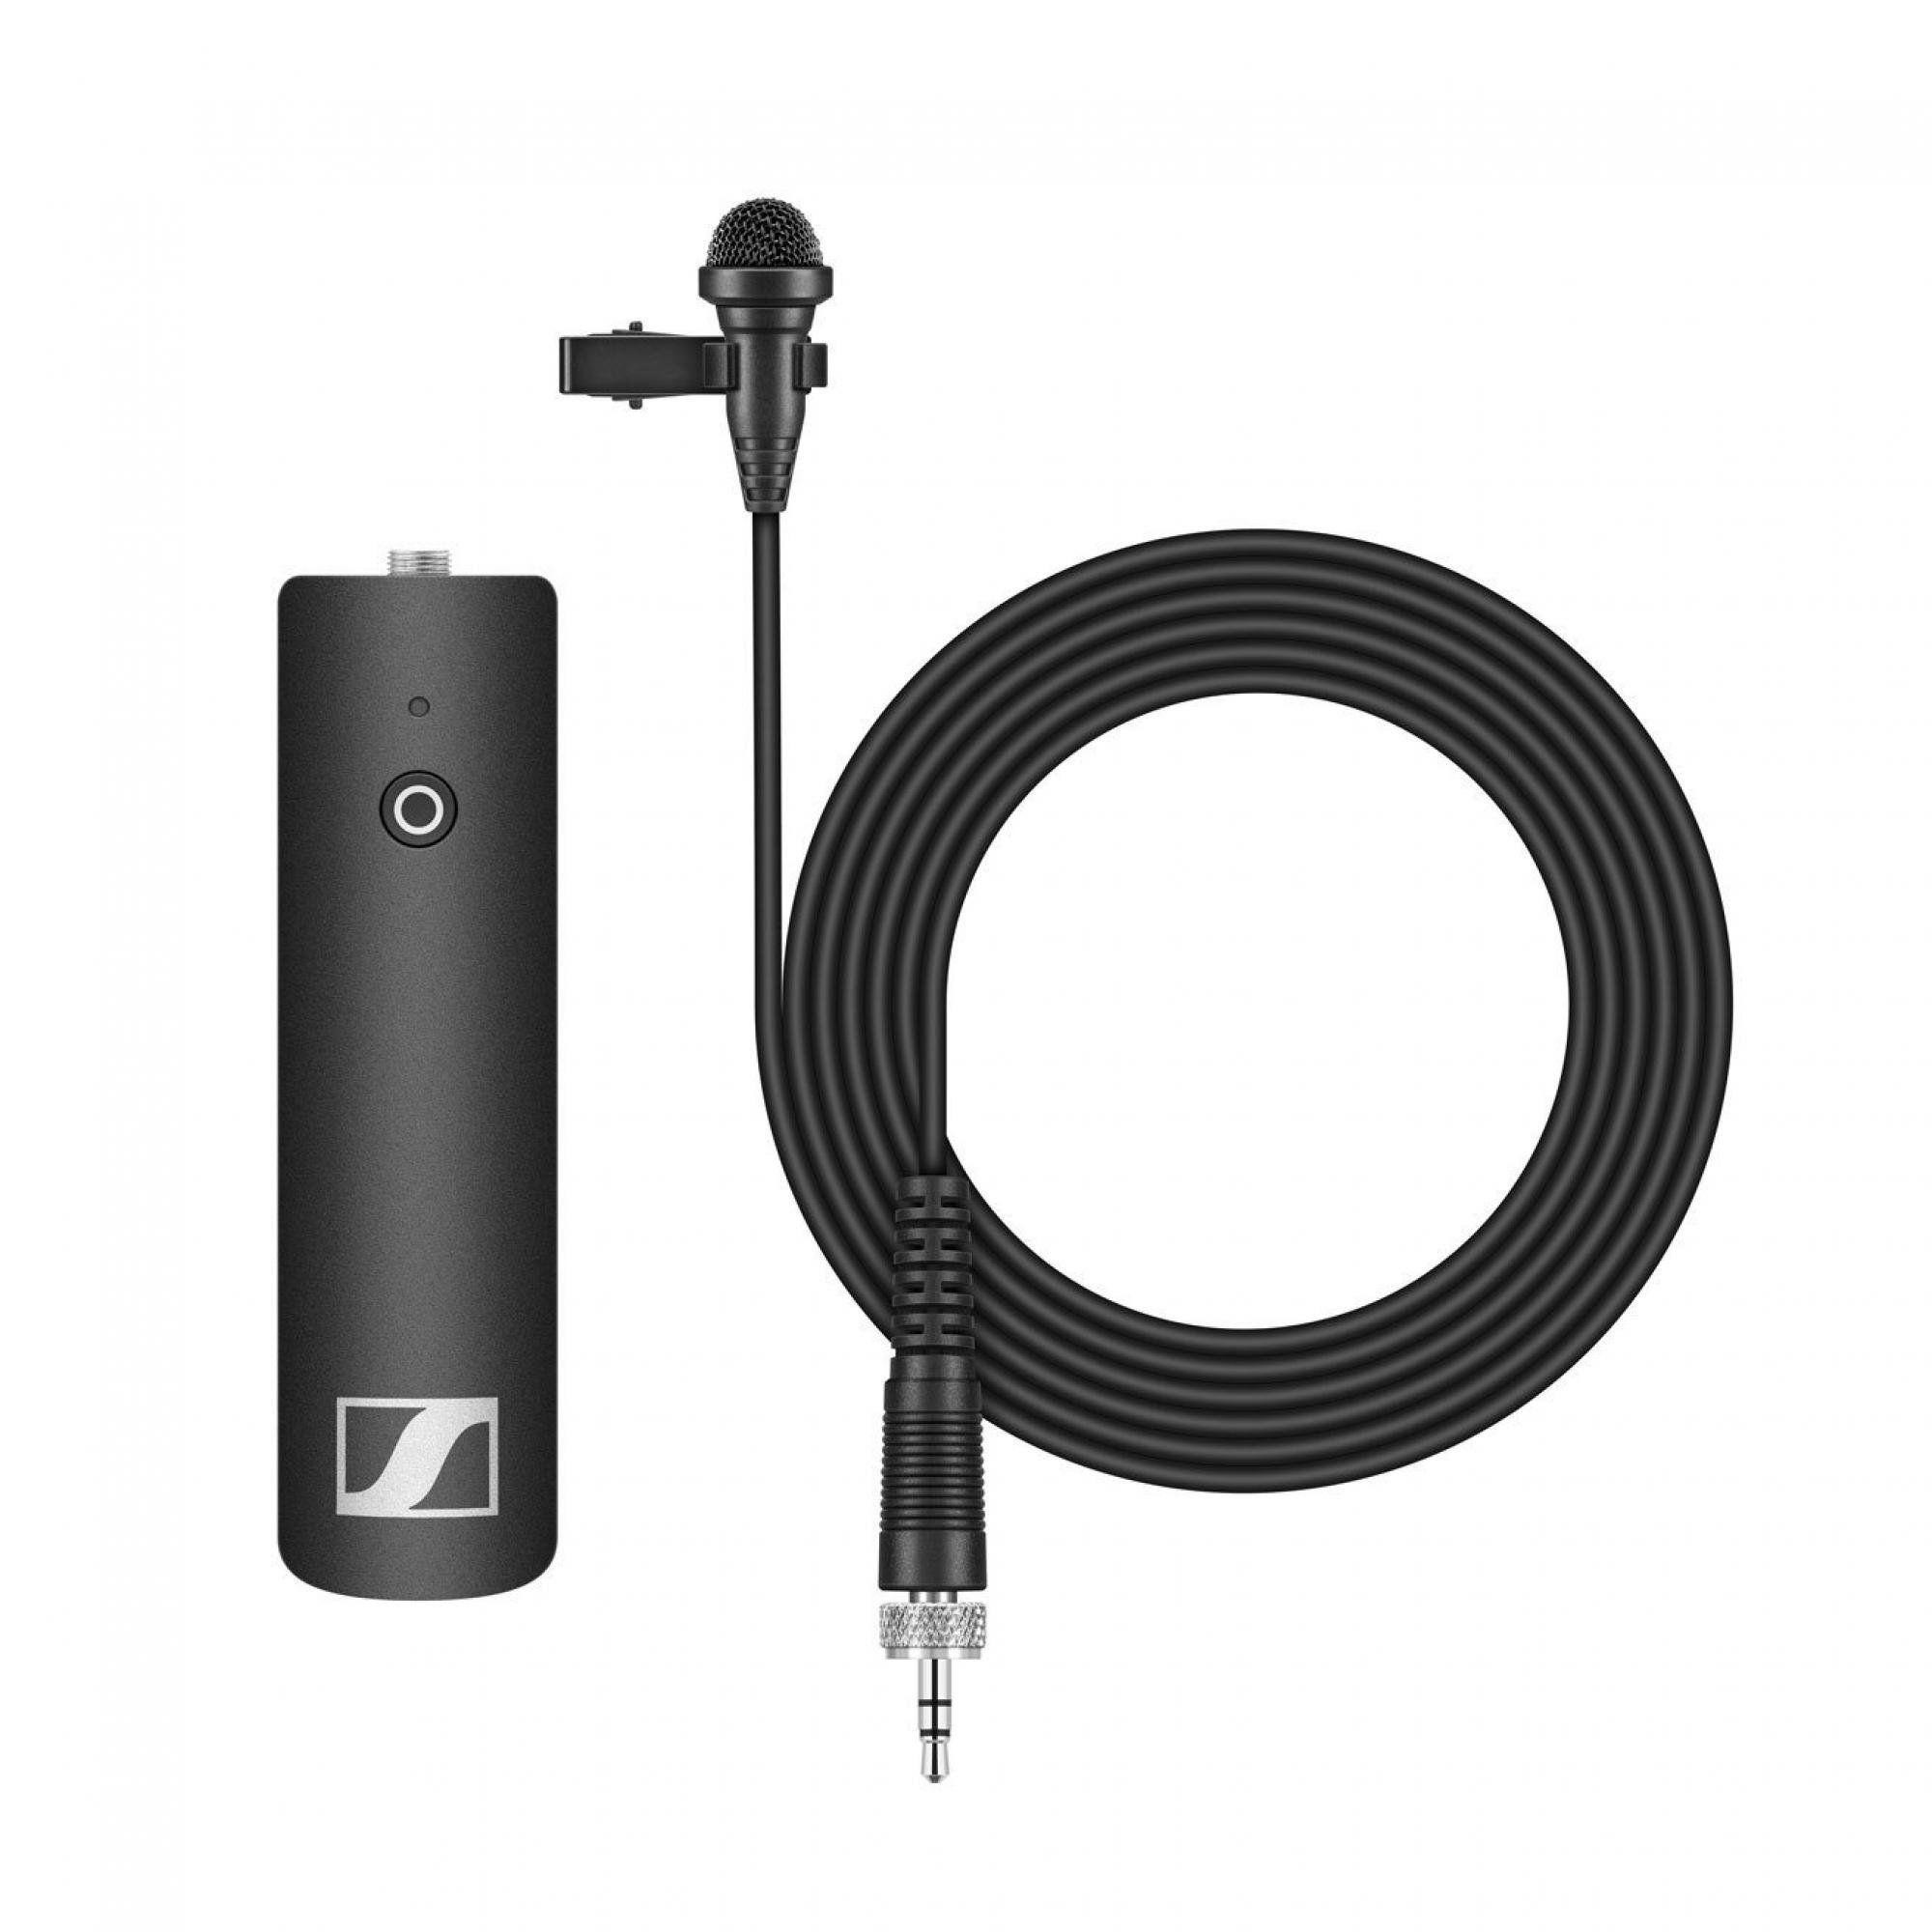 Kit de Microfone sem Fio XSW-D Lavalier Set Sennheiser